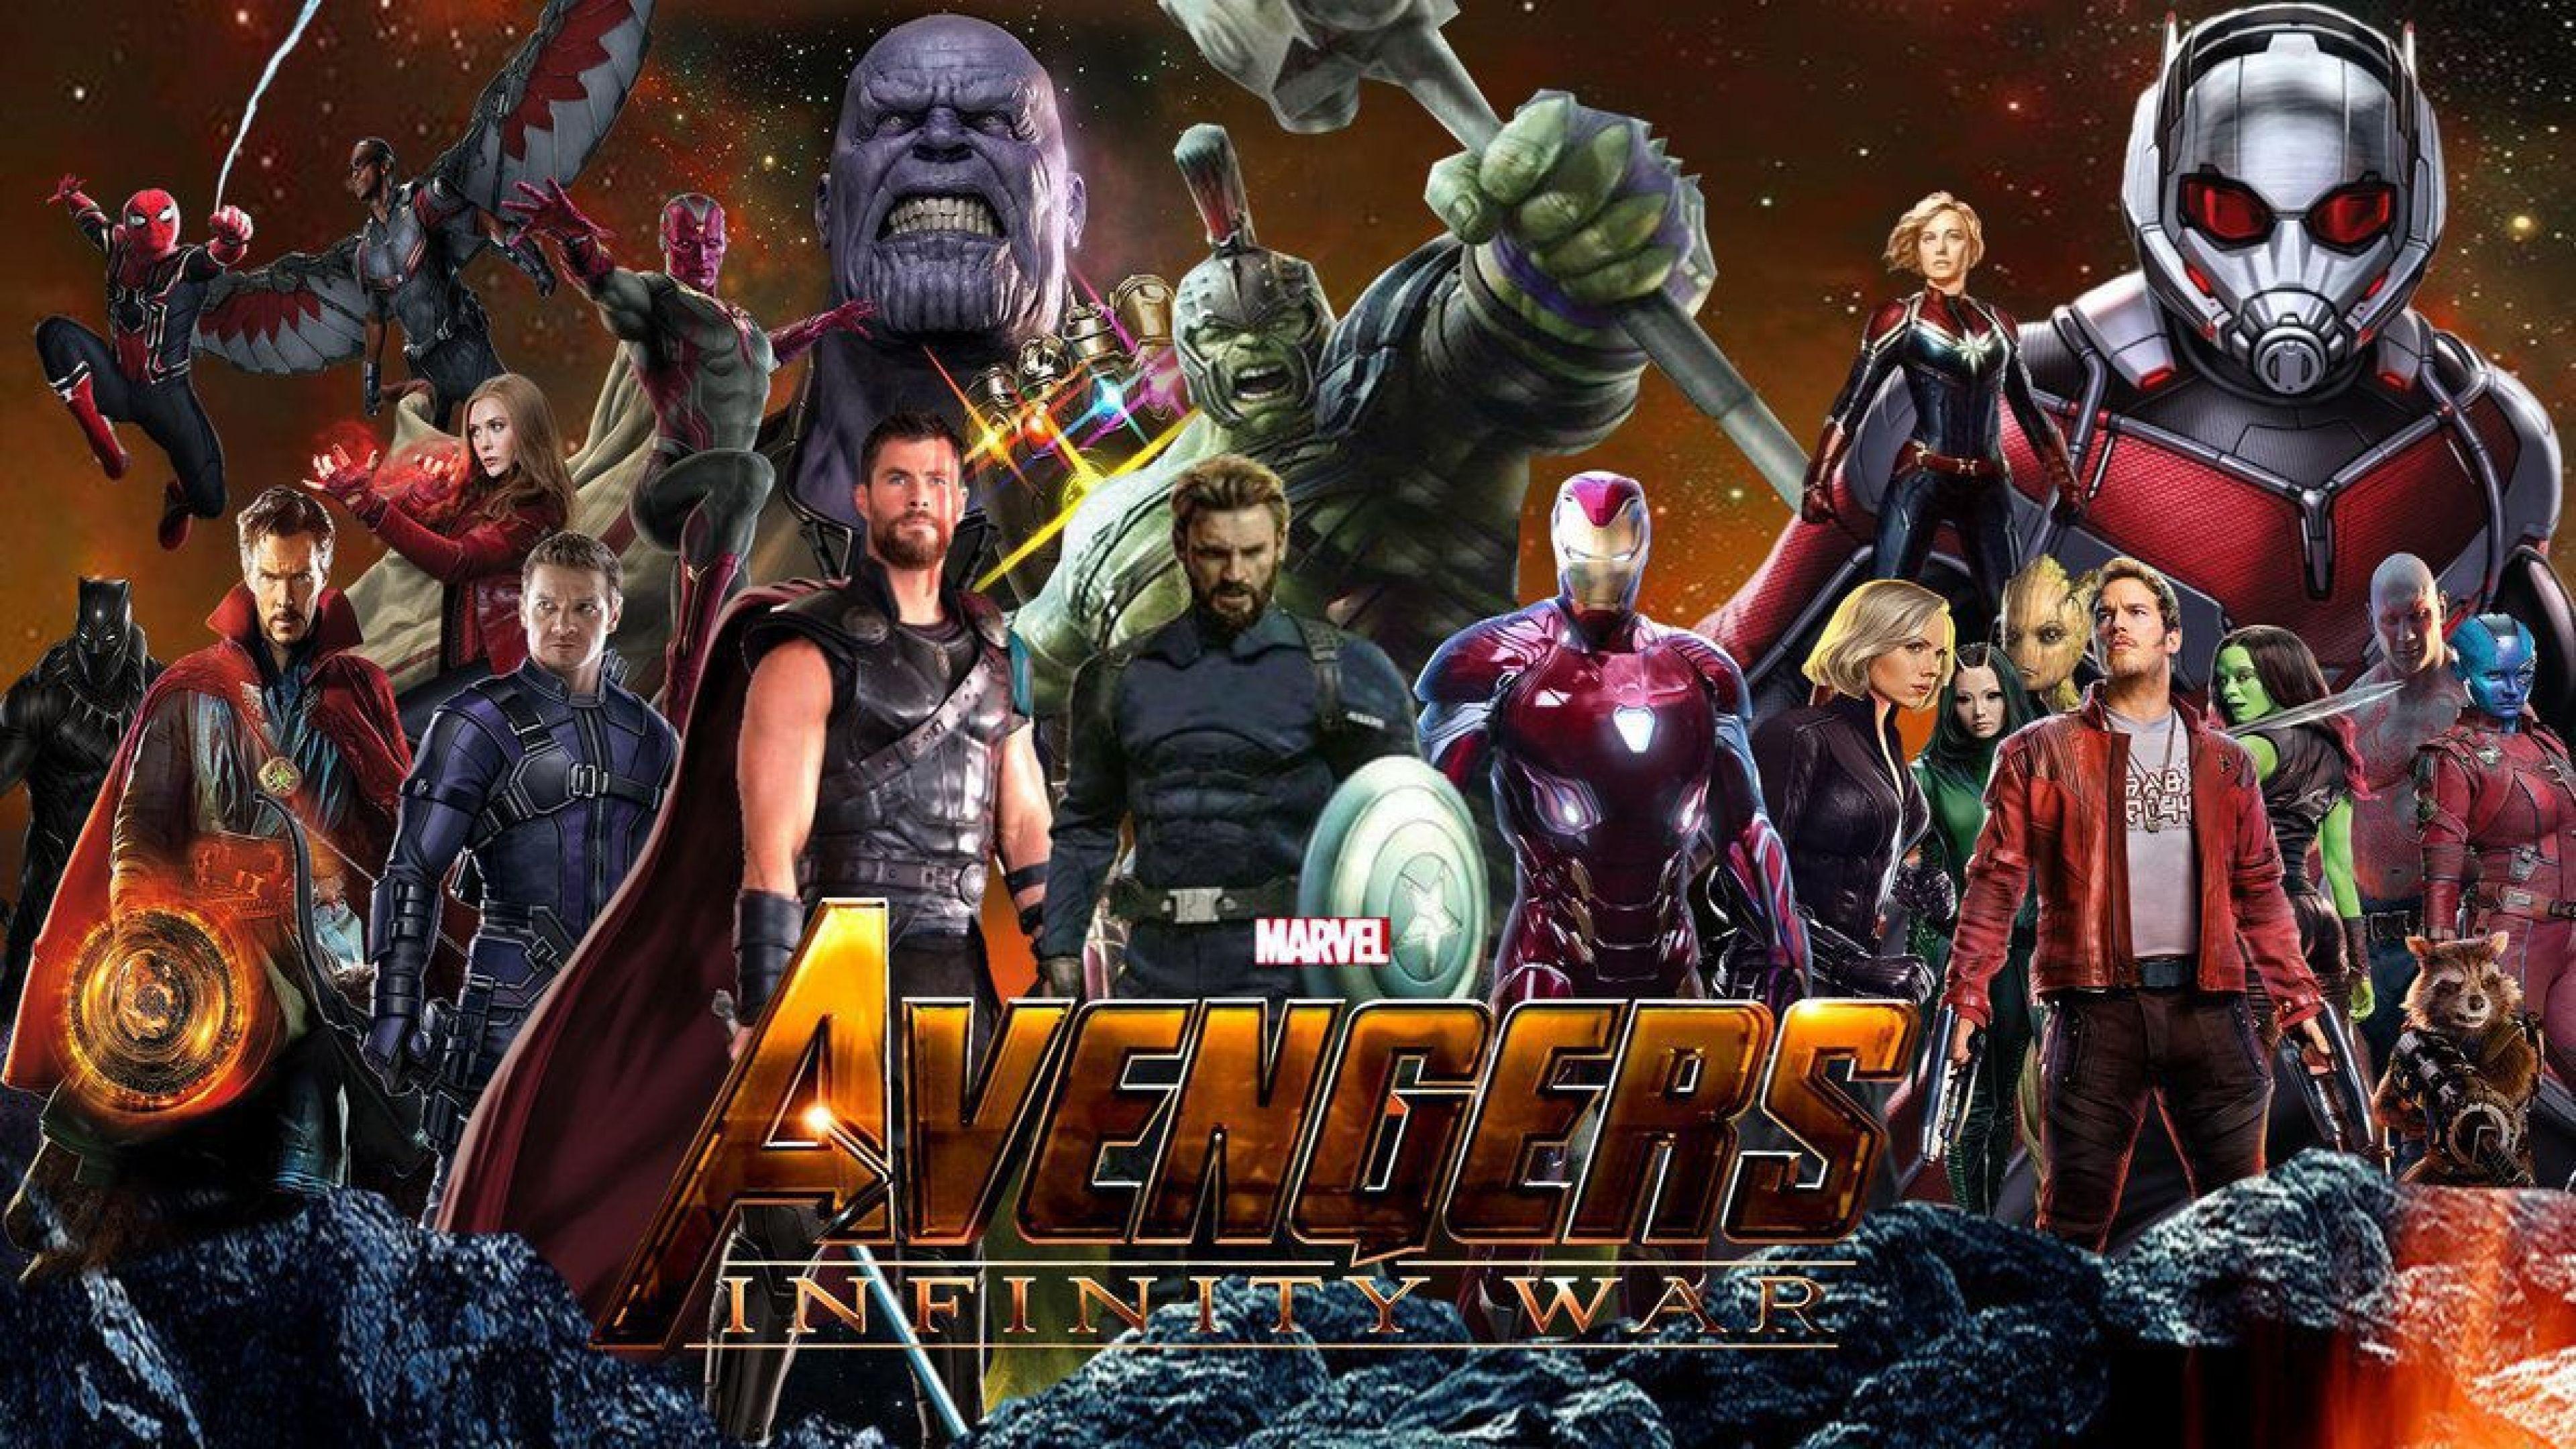 Marvel 3840 x 2160 wallpapers top free marvel 3840 x - Avengers civil war wallpaper ...